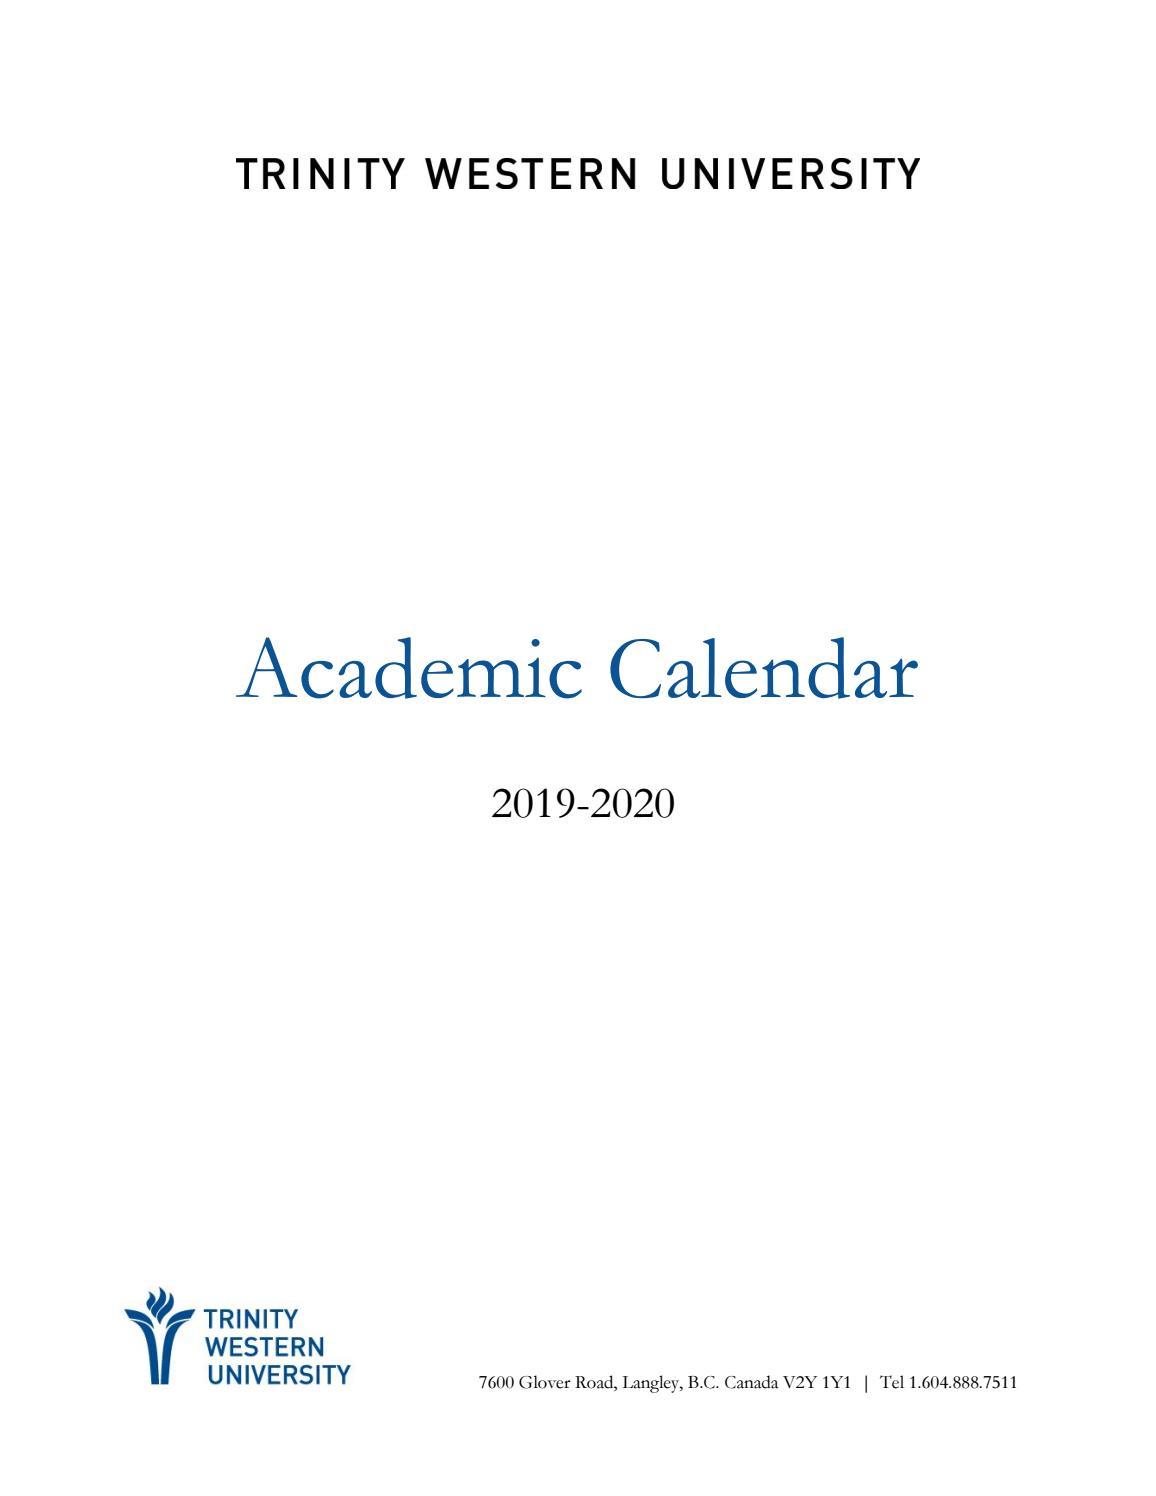 2019-20 Academic Calendartwu - Issuu pertaining to Saint Rose Academic Calendar